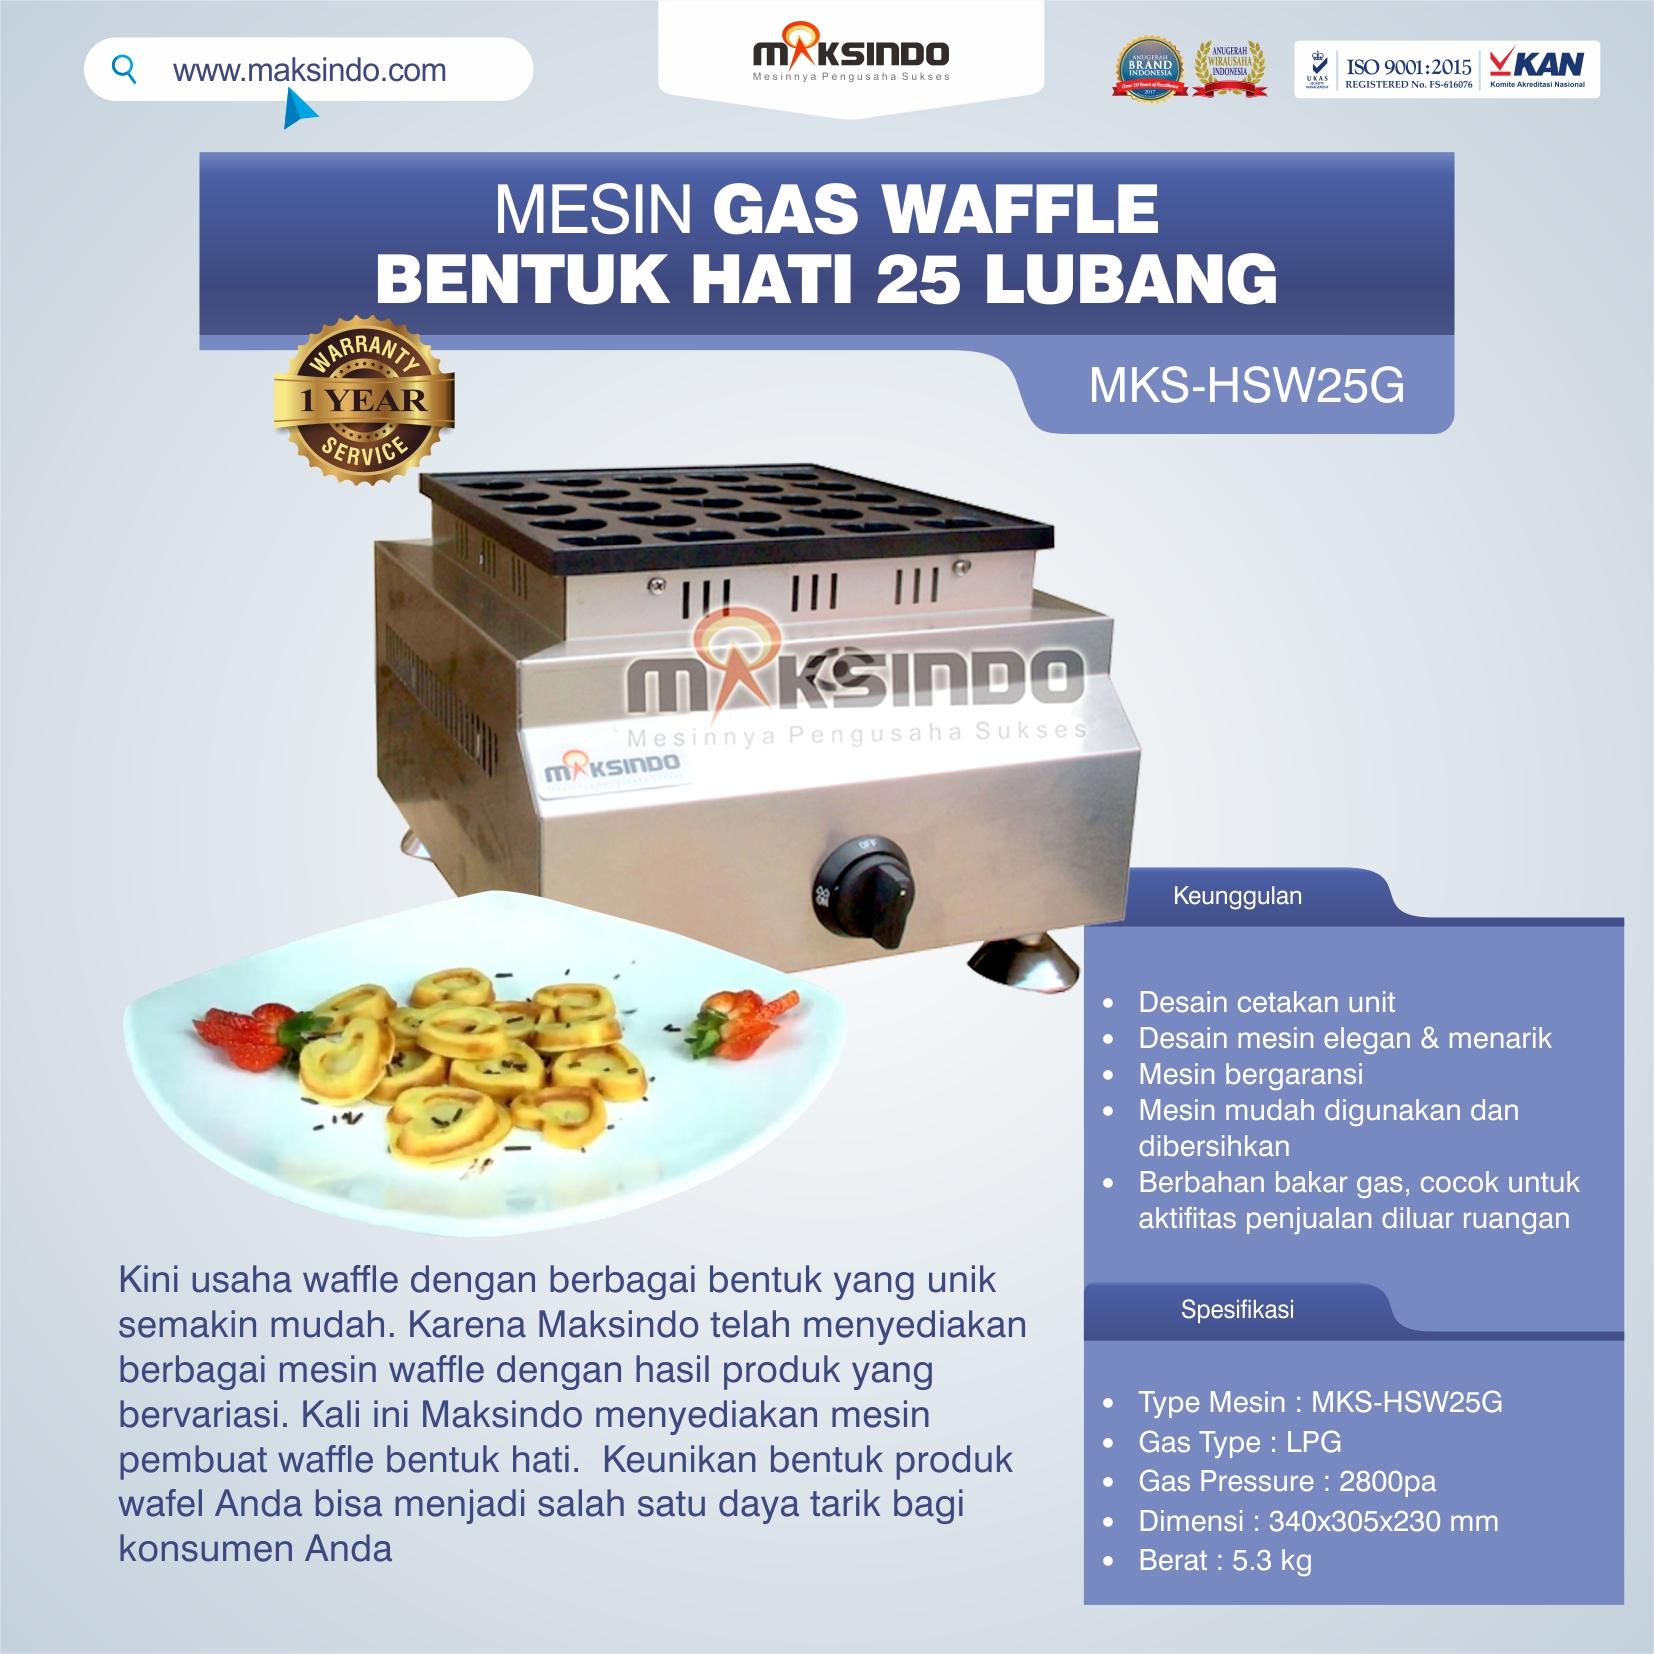 Jual Gas Waffle Bentuk Hati 25 Lubang MKS-HSW25G di Solo